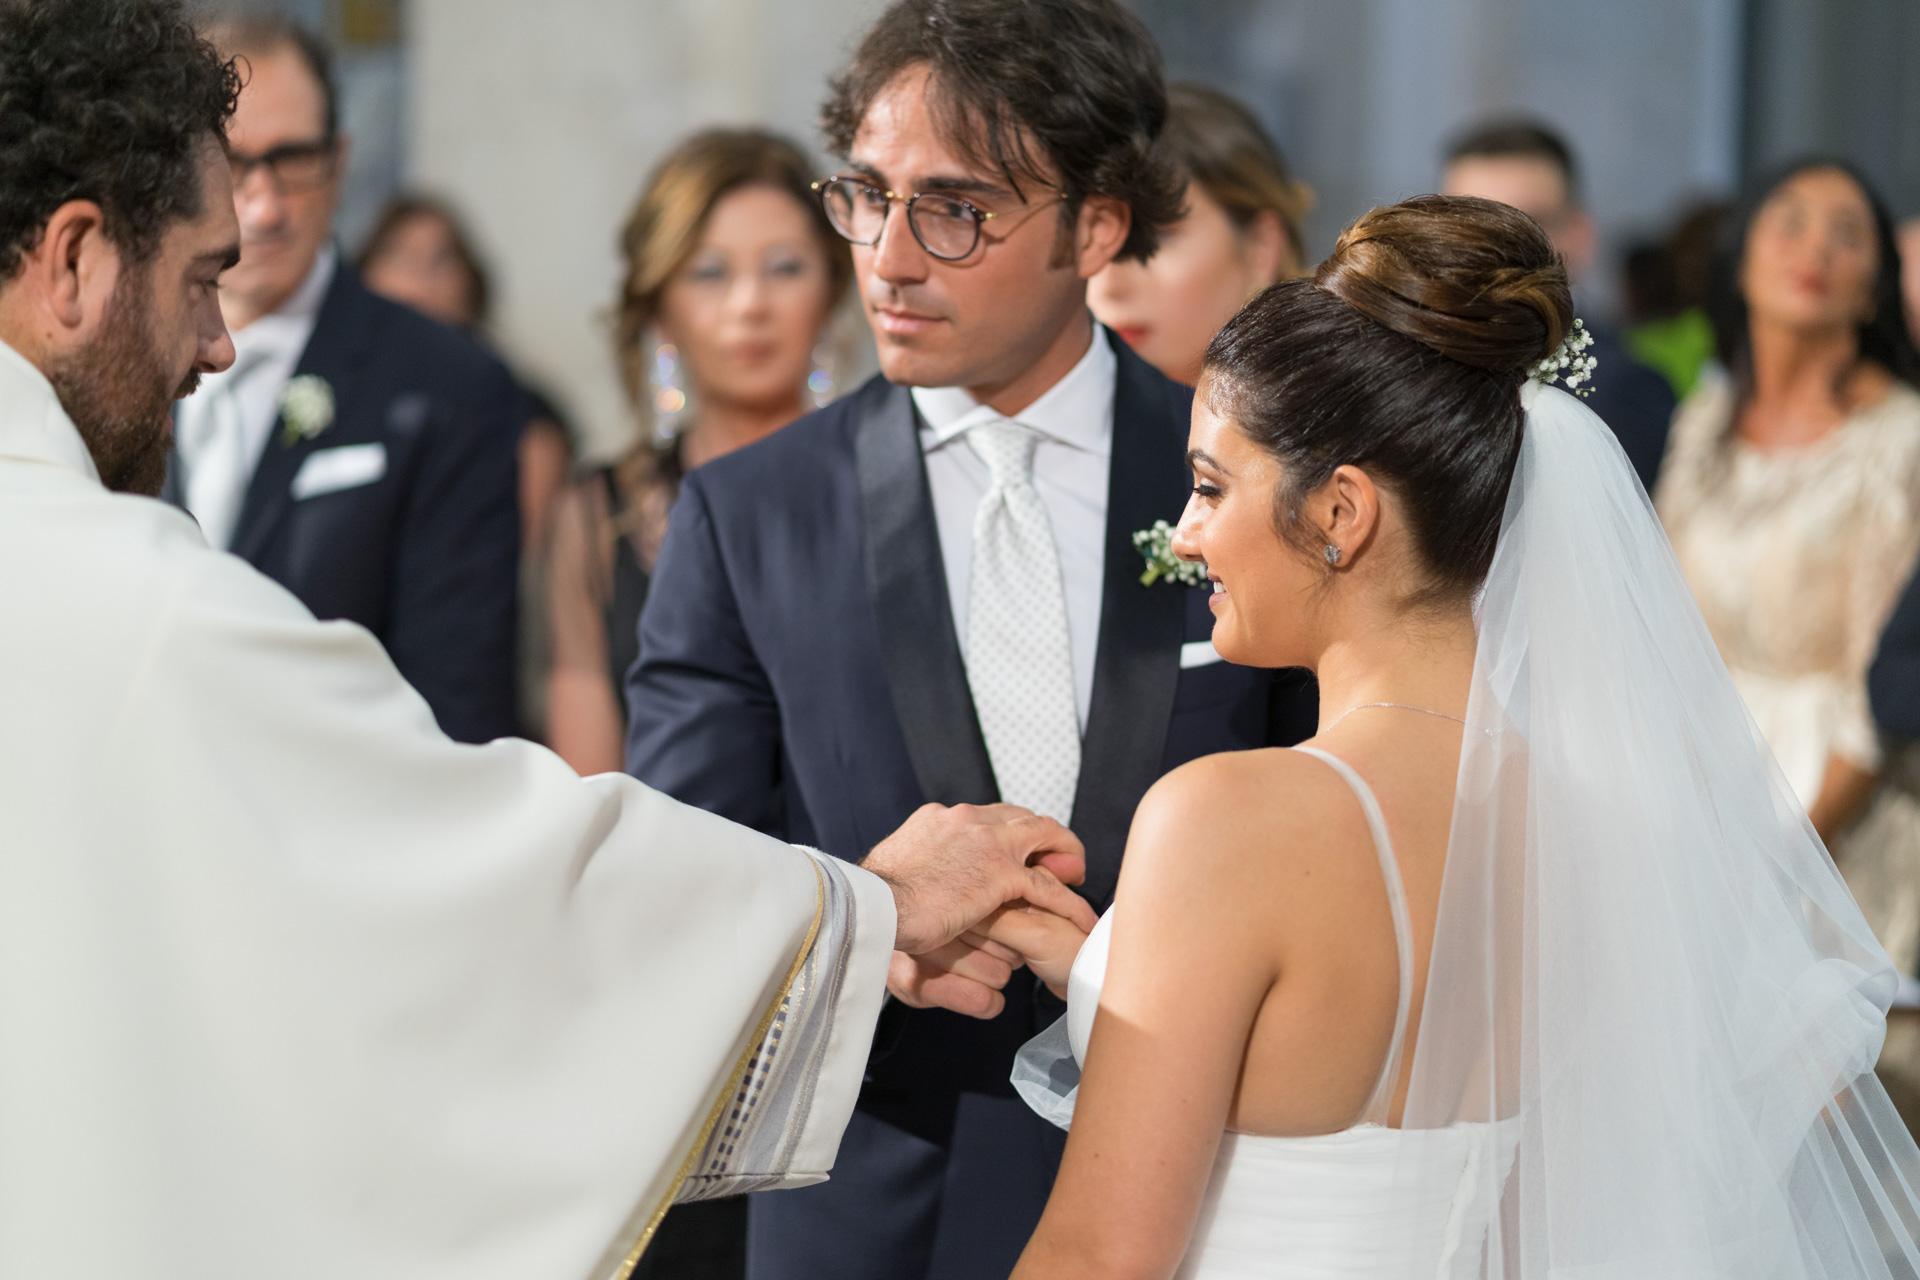 merafina photographer alfonso merafina fotografo wedding matrimonio andria francesca e antonio (15)